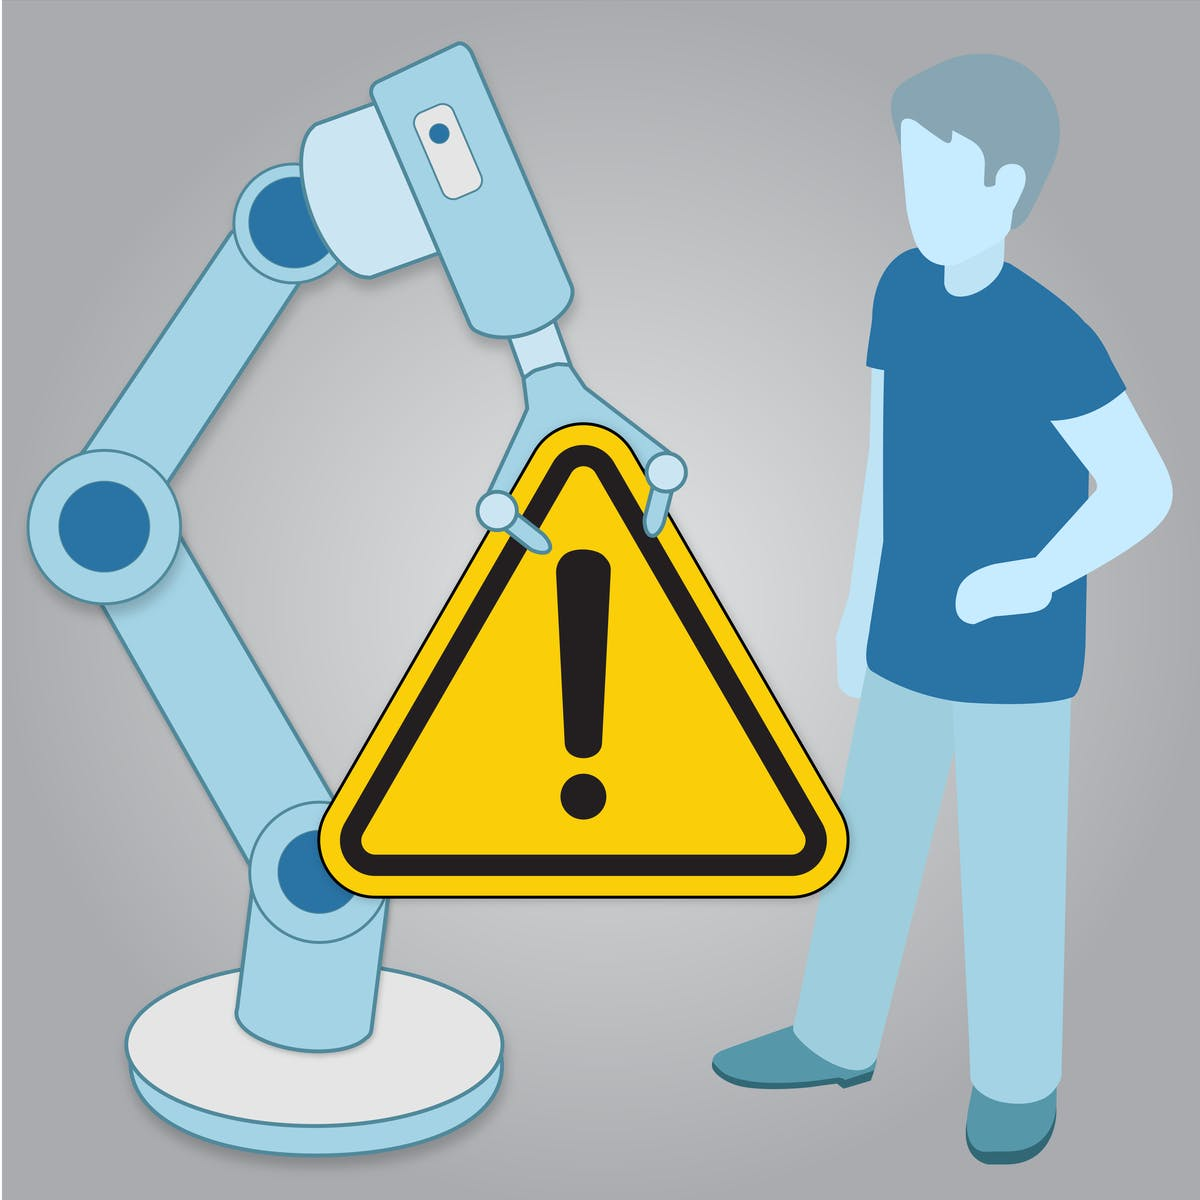 Collaborative Robot Safety: Design & Deployment